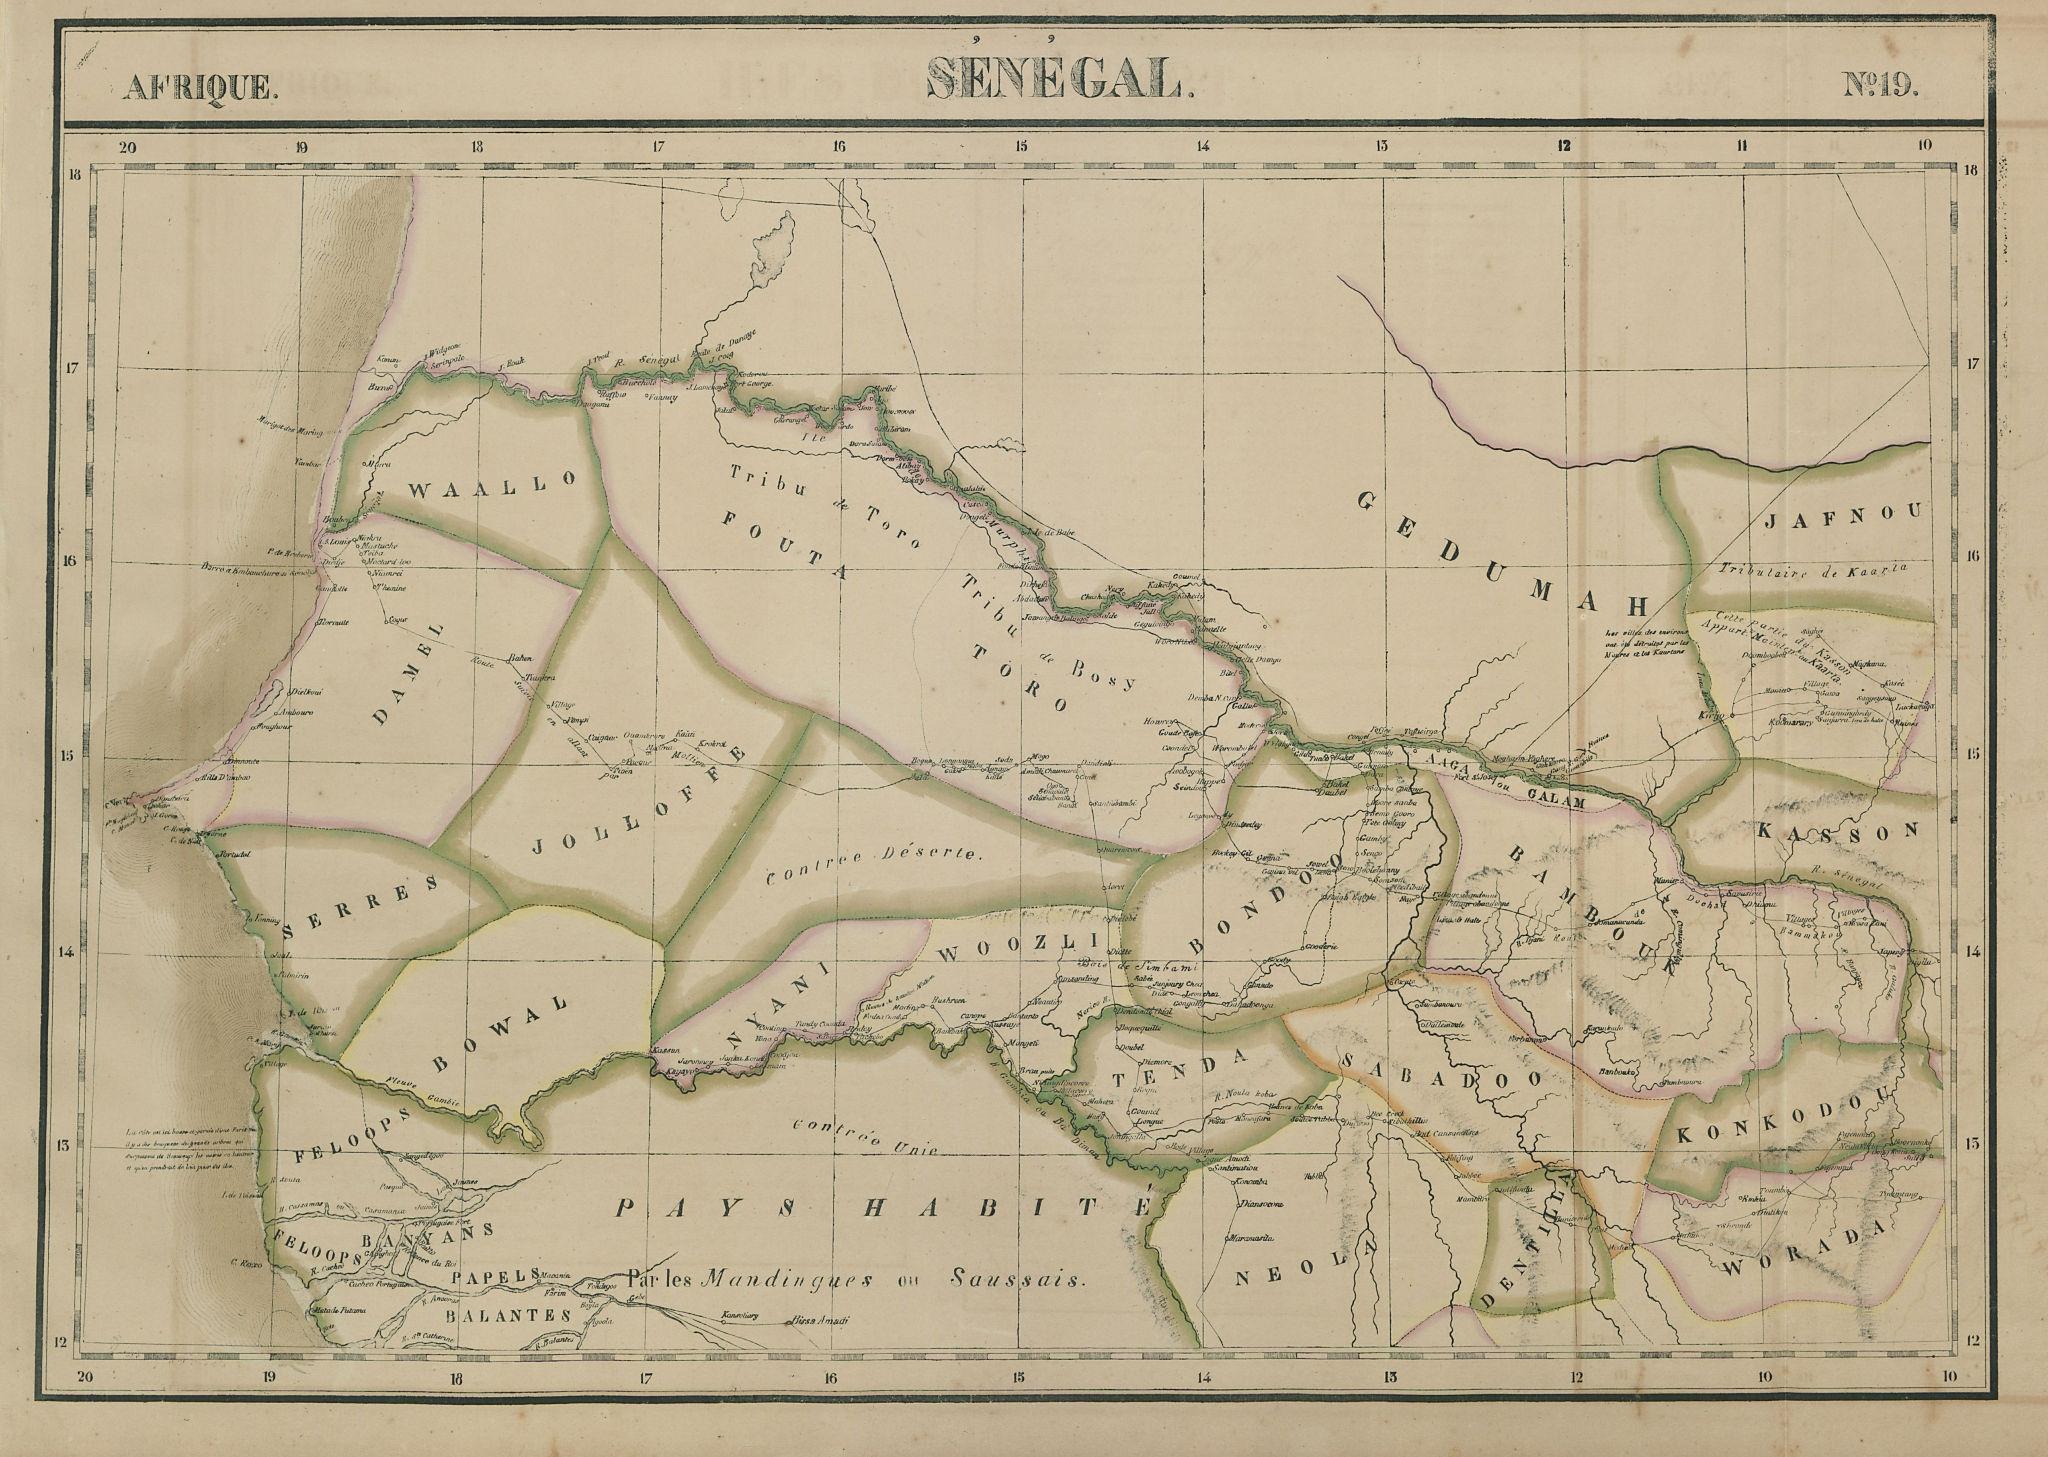 Afrique. Sénégal #19 Senegal, Gambia & southern Mauritania VANDERMAELEN 1827 map